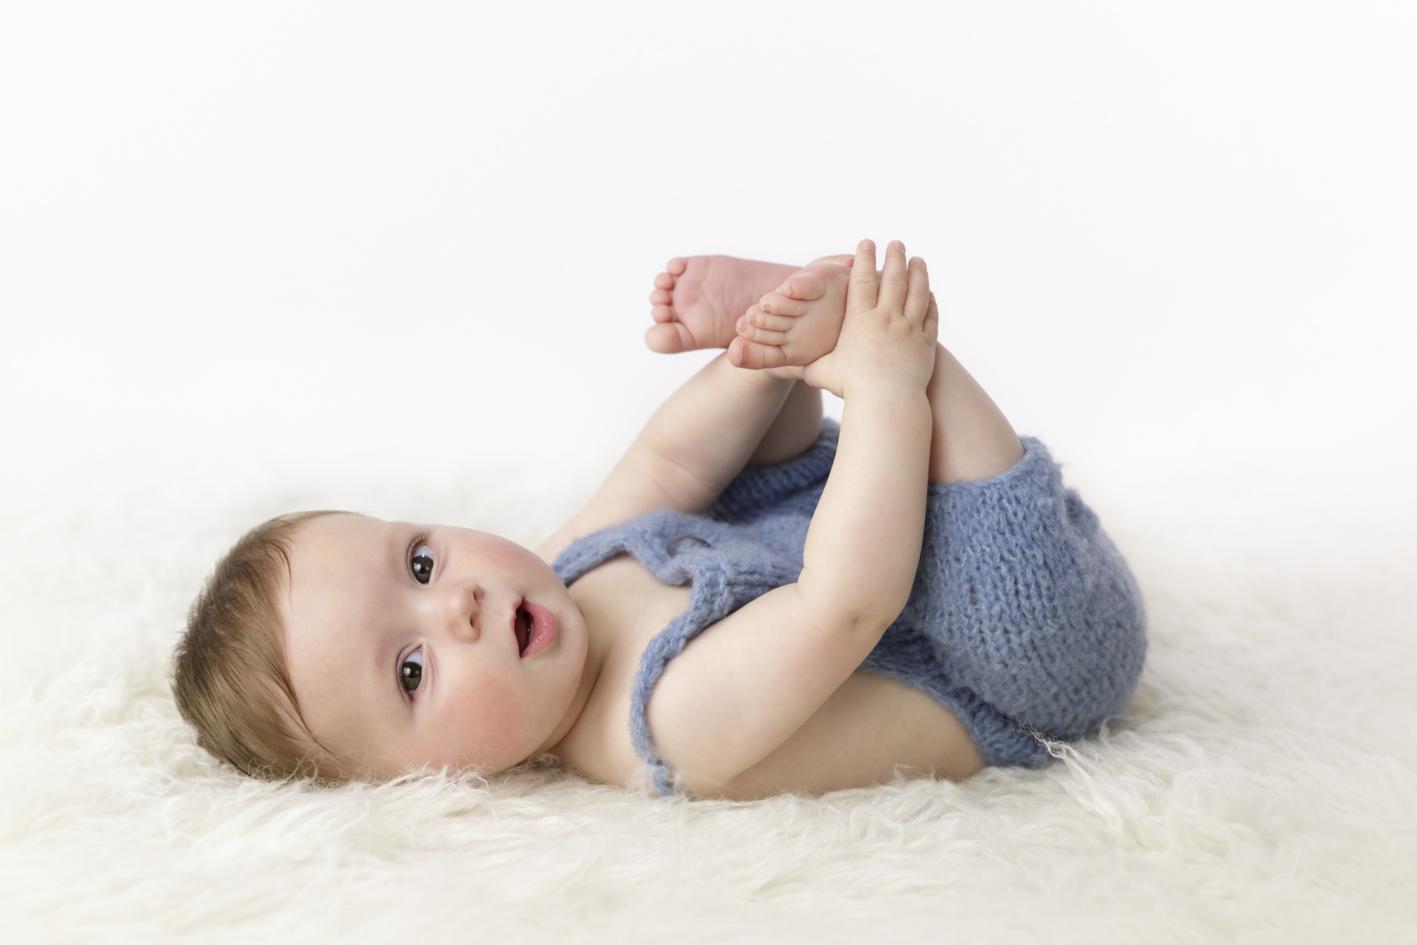 baby boy grabbing feet